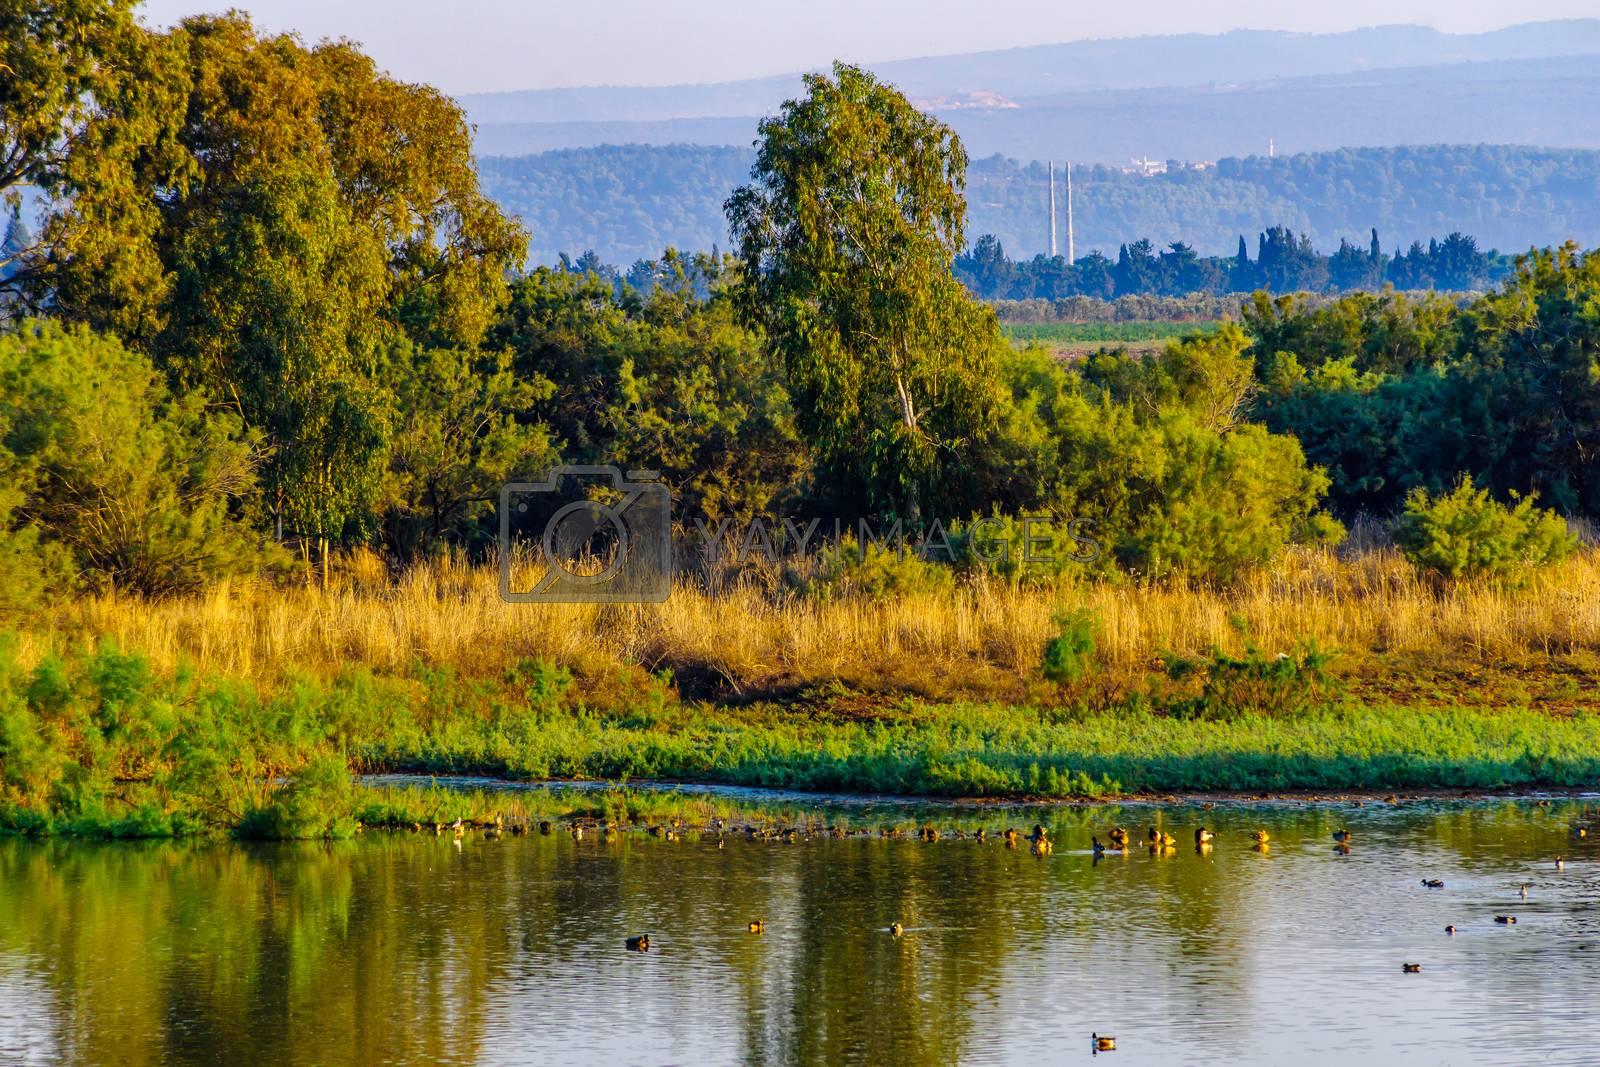 Morning view over wetland with various birds, in En Afek nature reserve, northern Israel